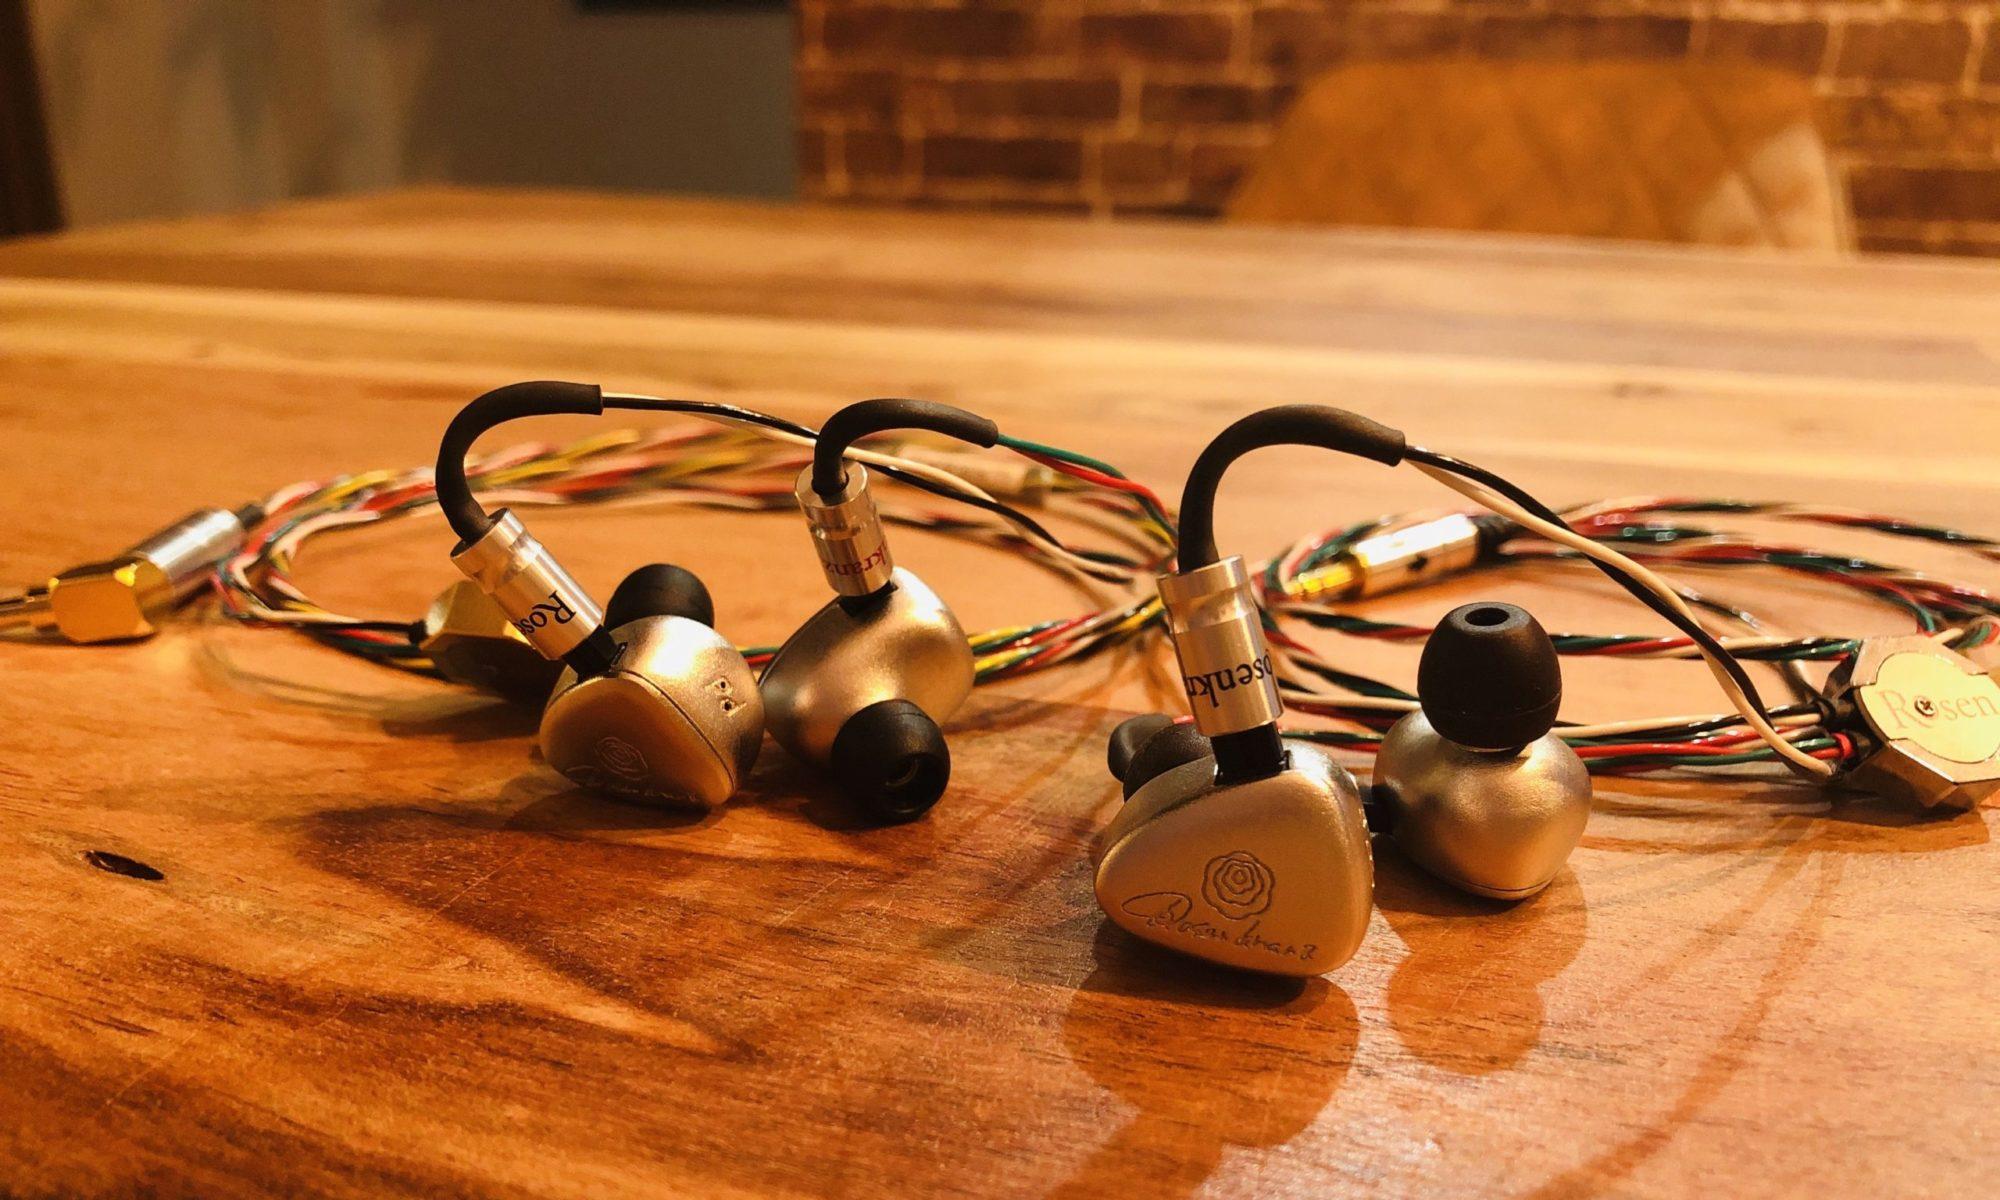 TSJ Sound ブログ